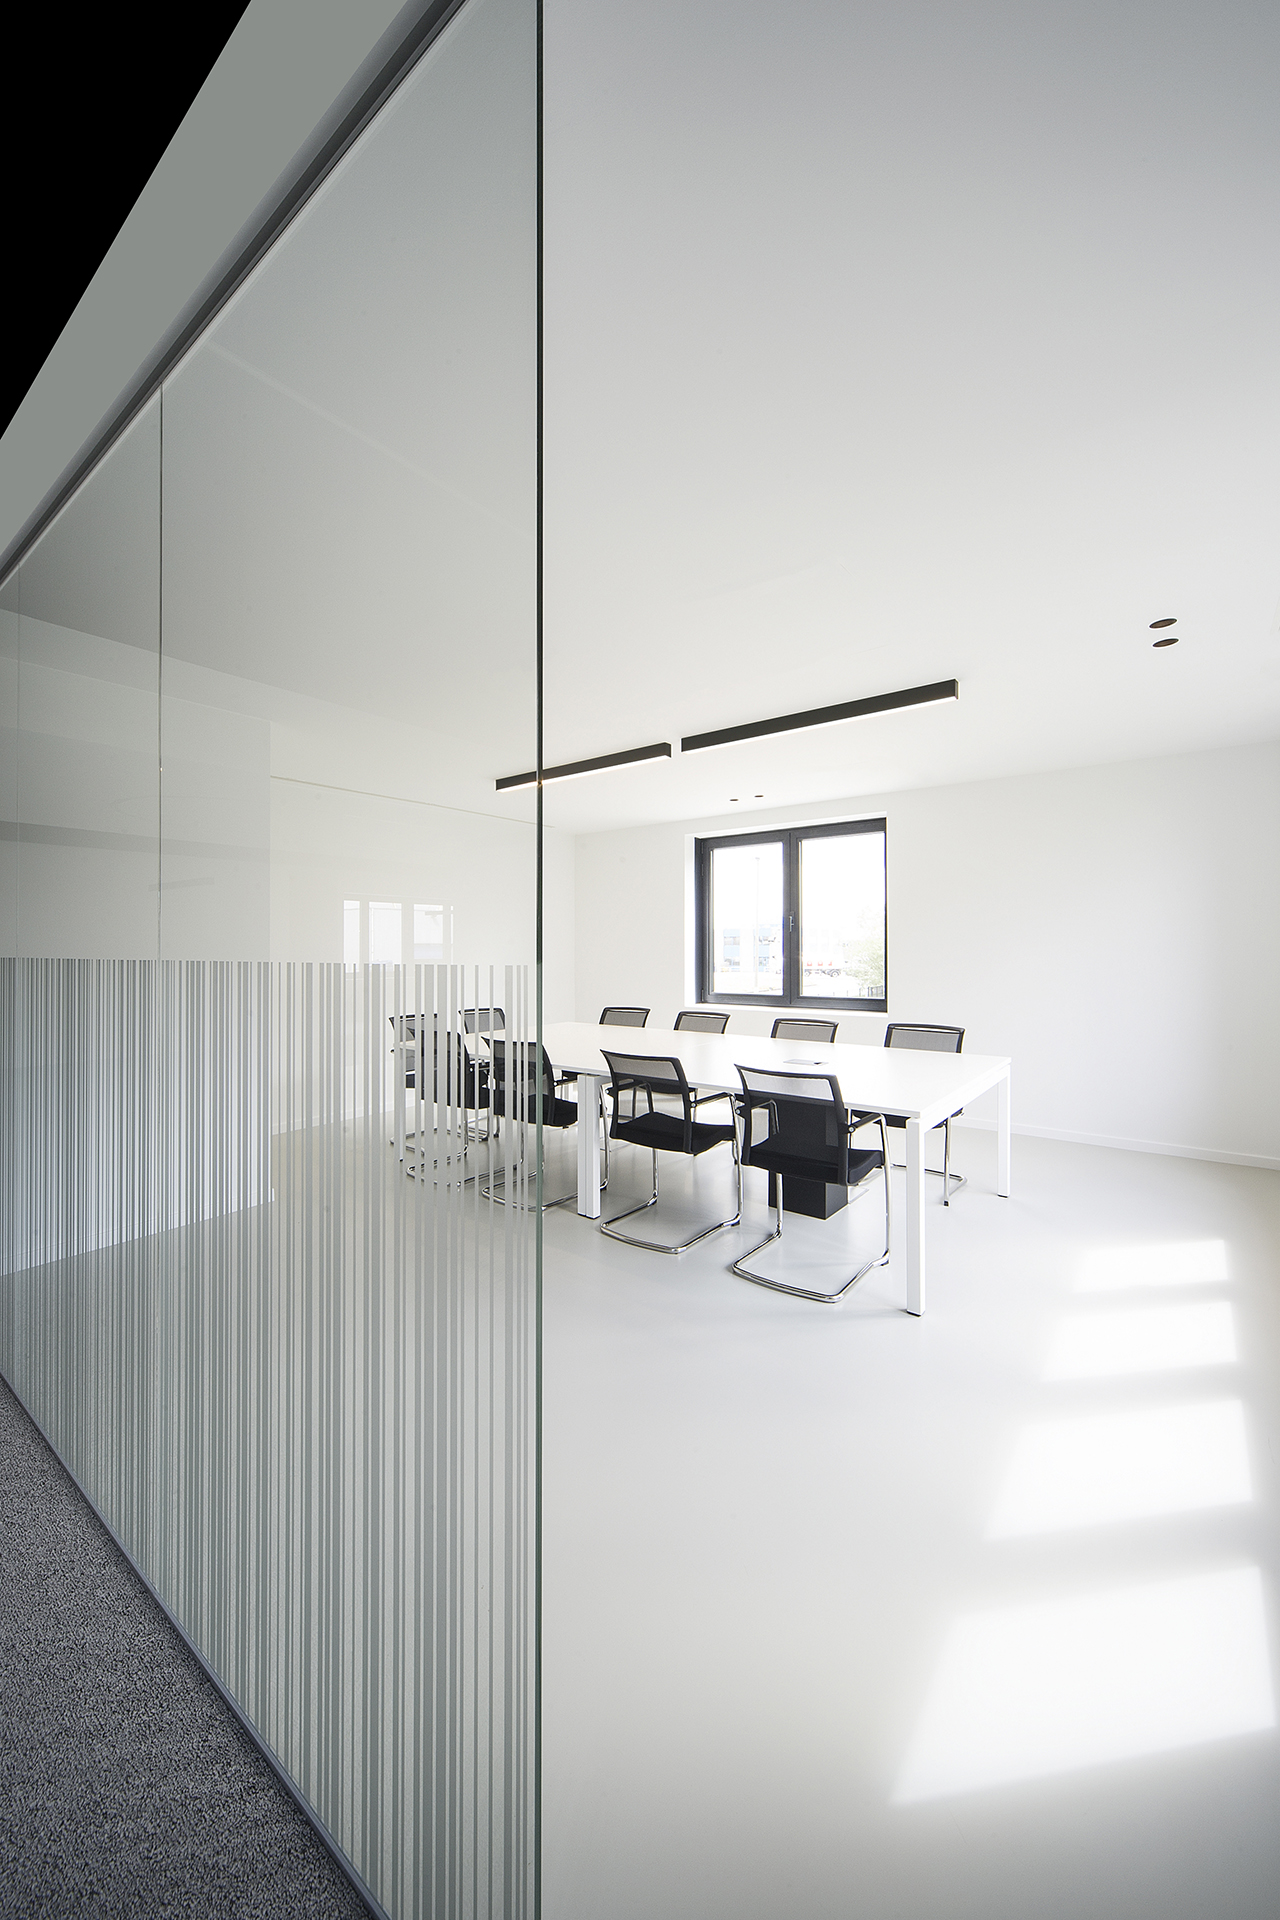 vergaderruimte, office, meeting room